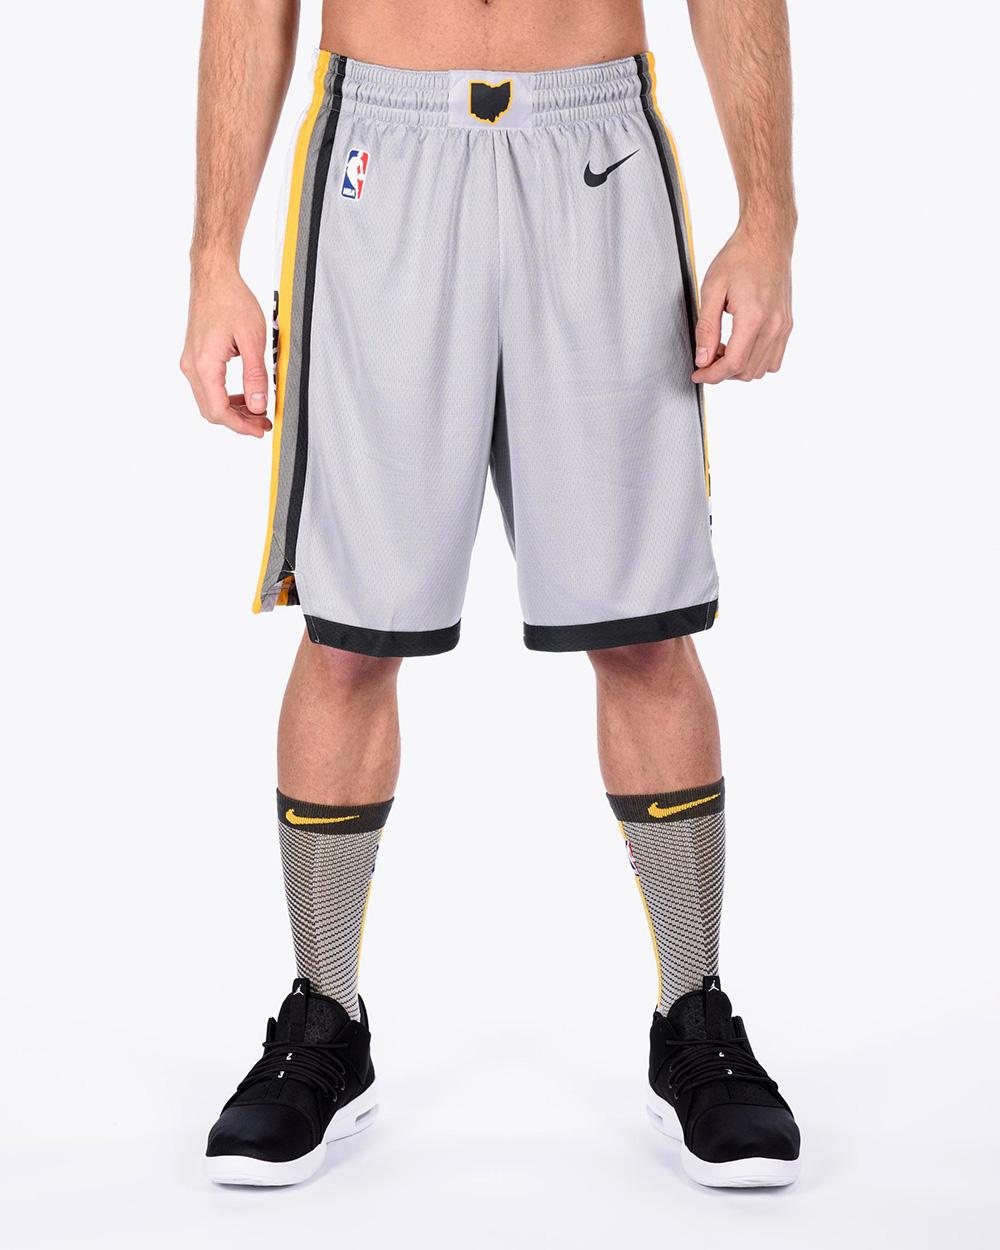 7cfc67569 Nike NBA Cleveland Cavaliers City Edition Swingman Shorts - NBA Shop  Cleveland Cavaliers Merchandise - Superfanas.lt